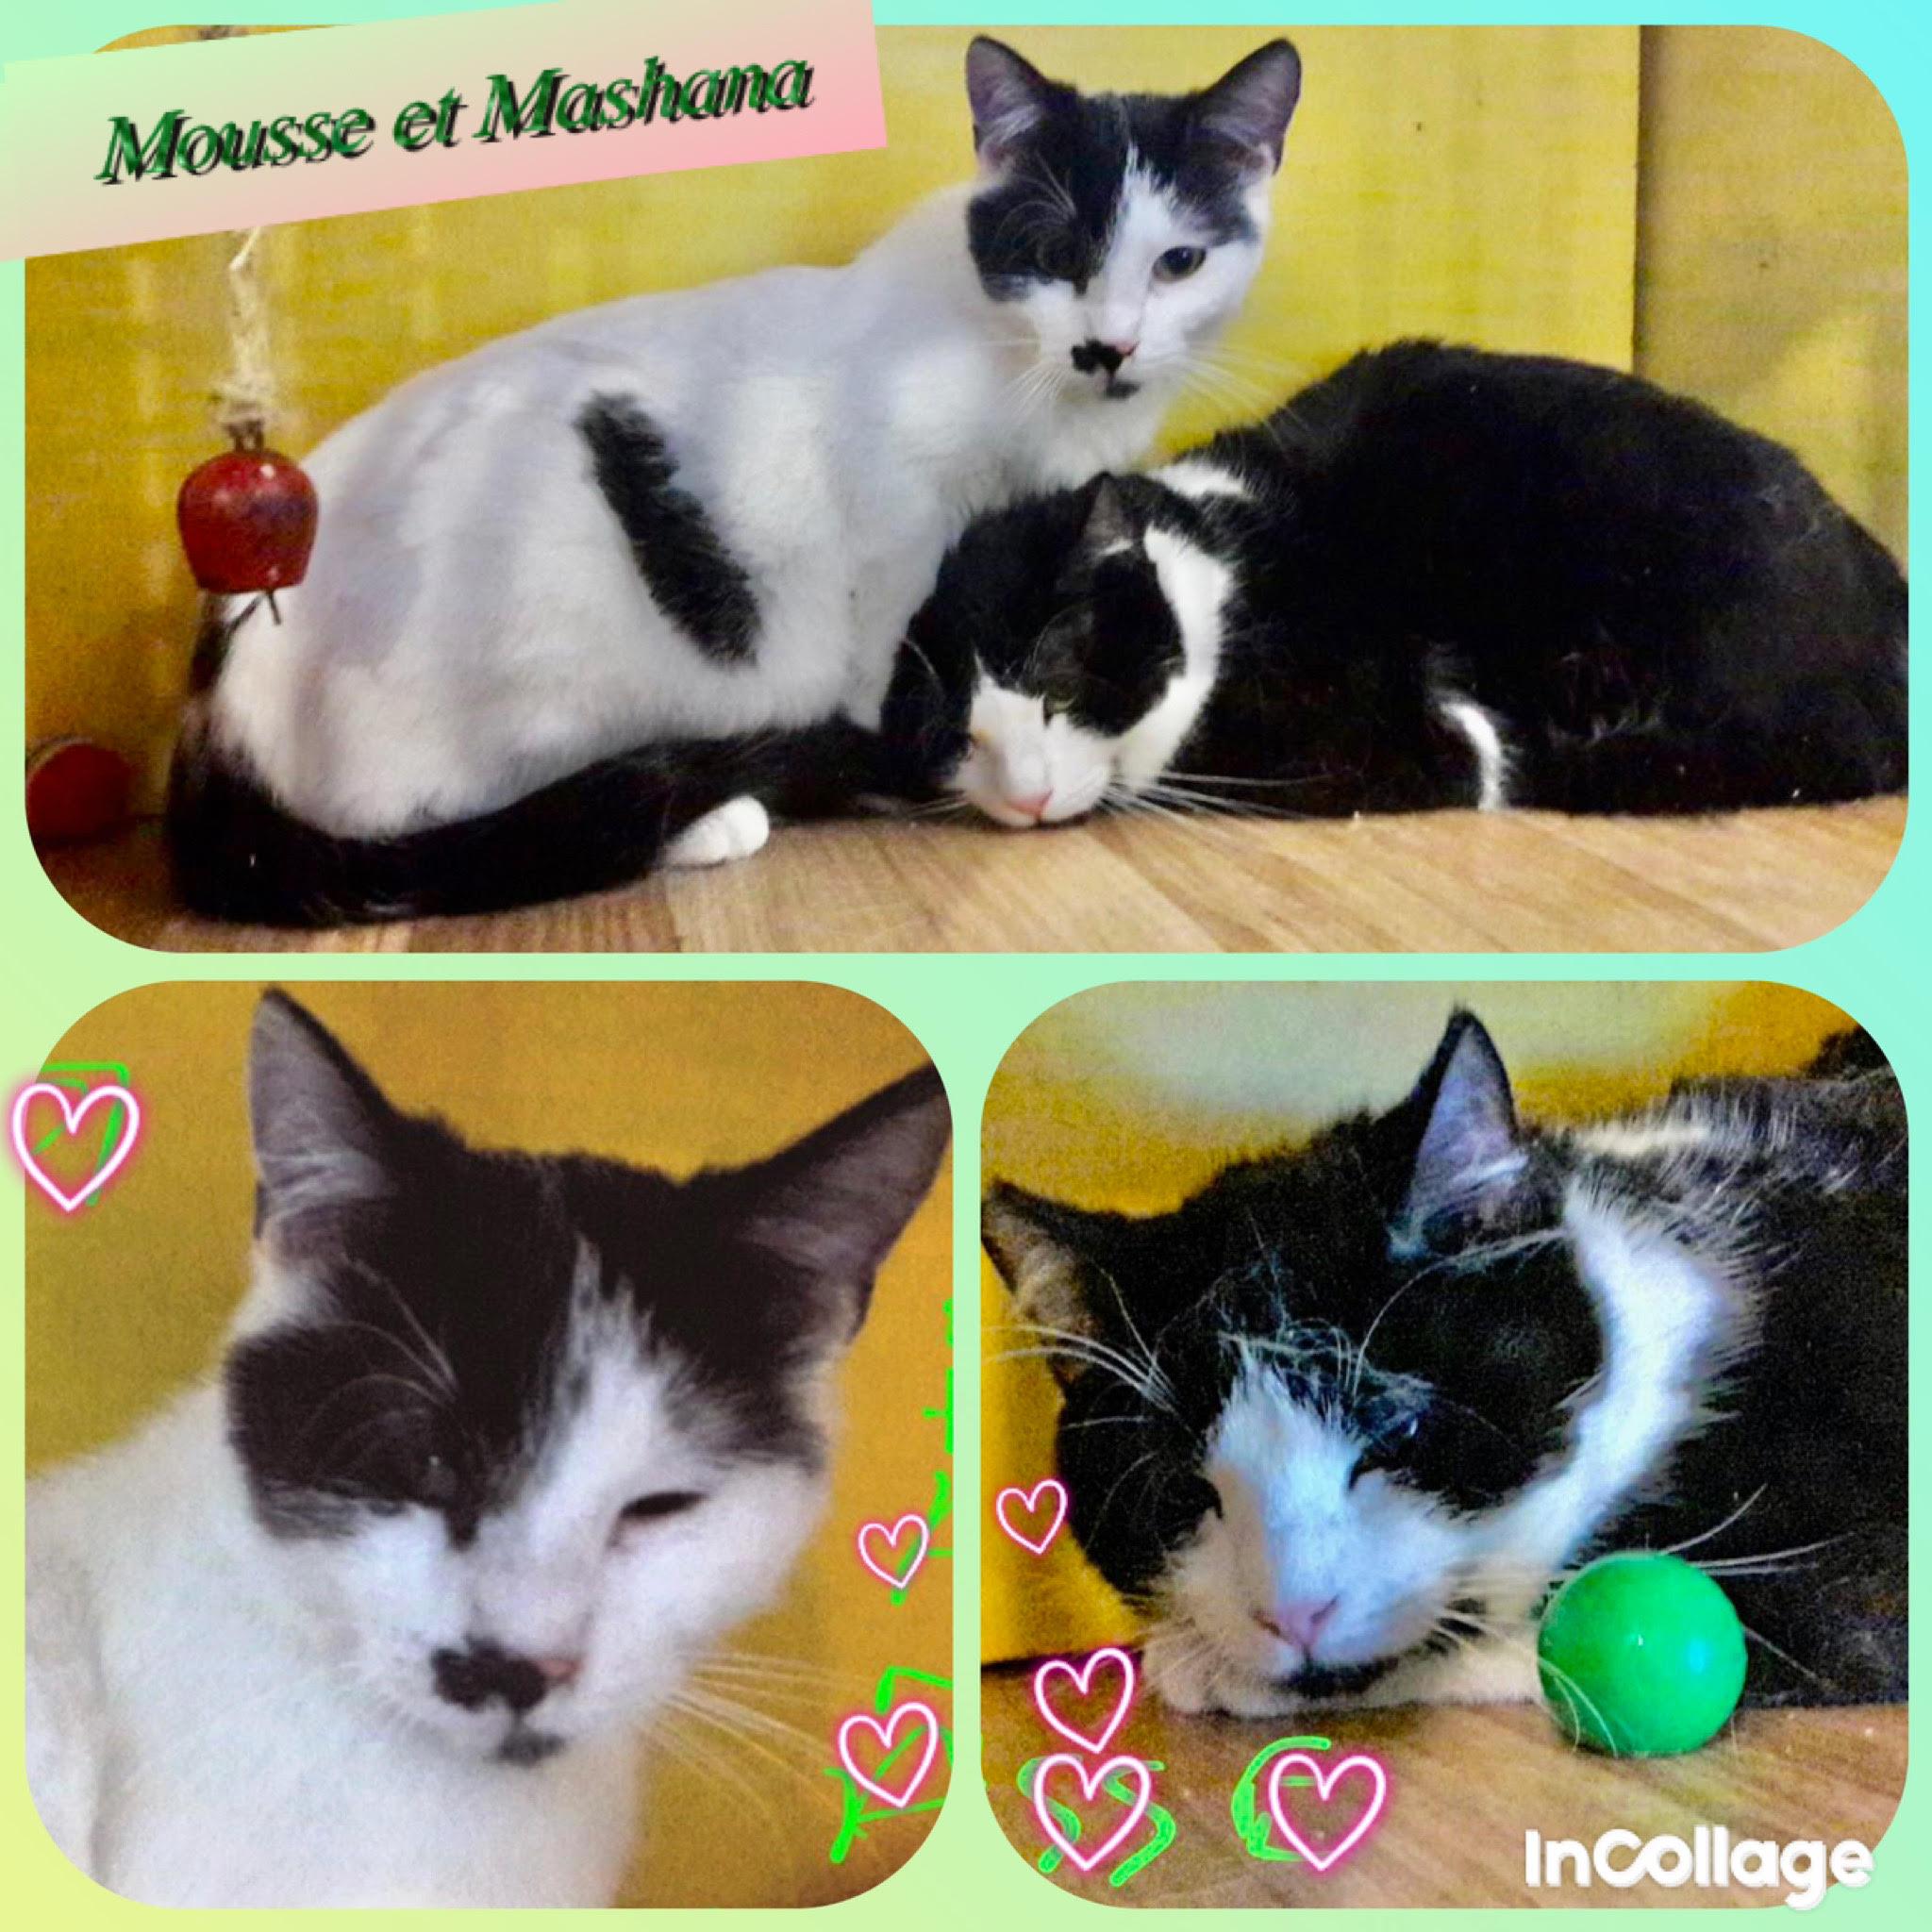 Mousse et Mashana : SOS !